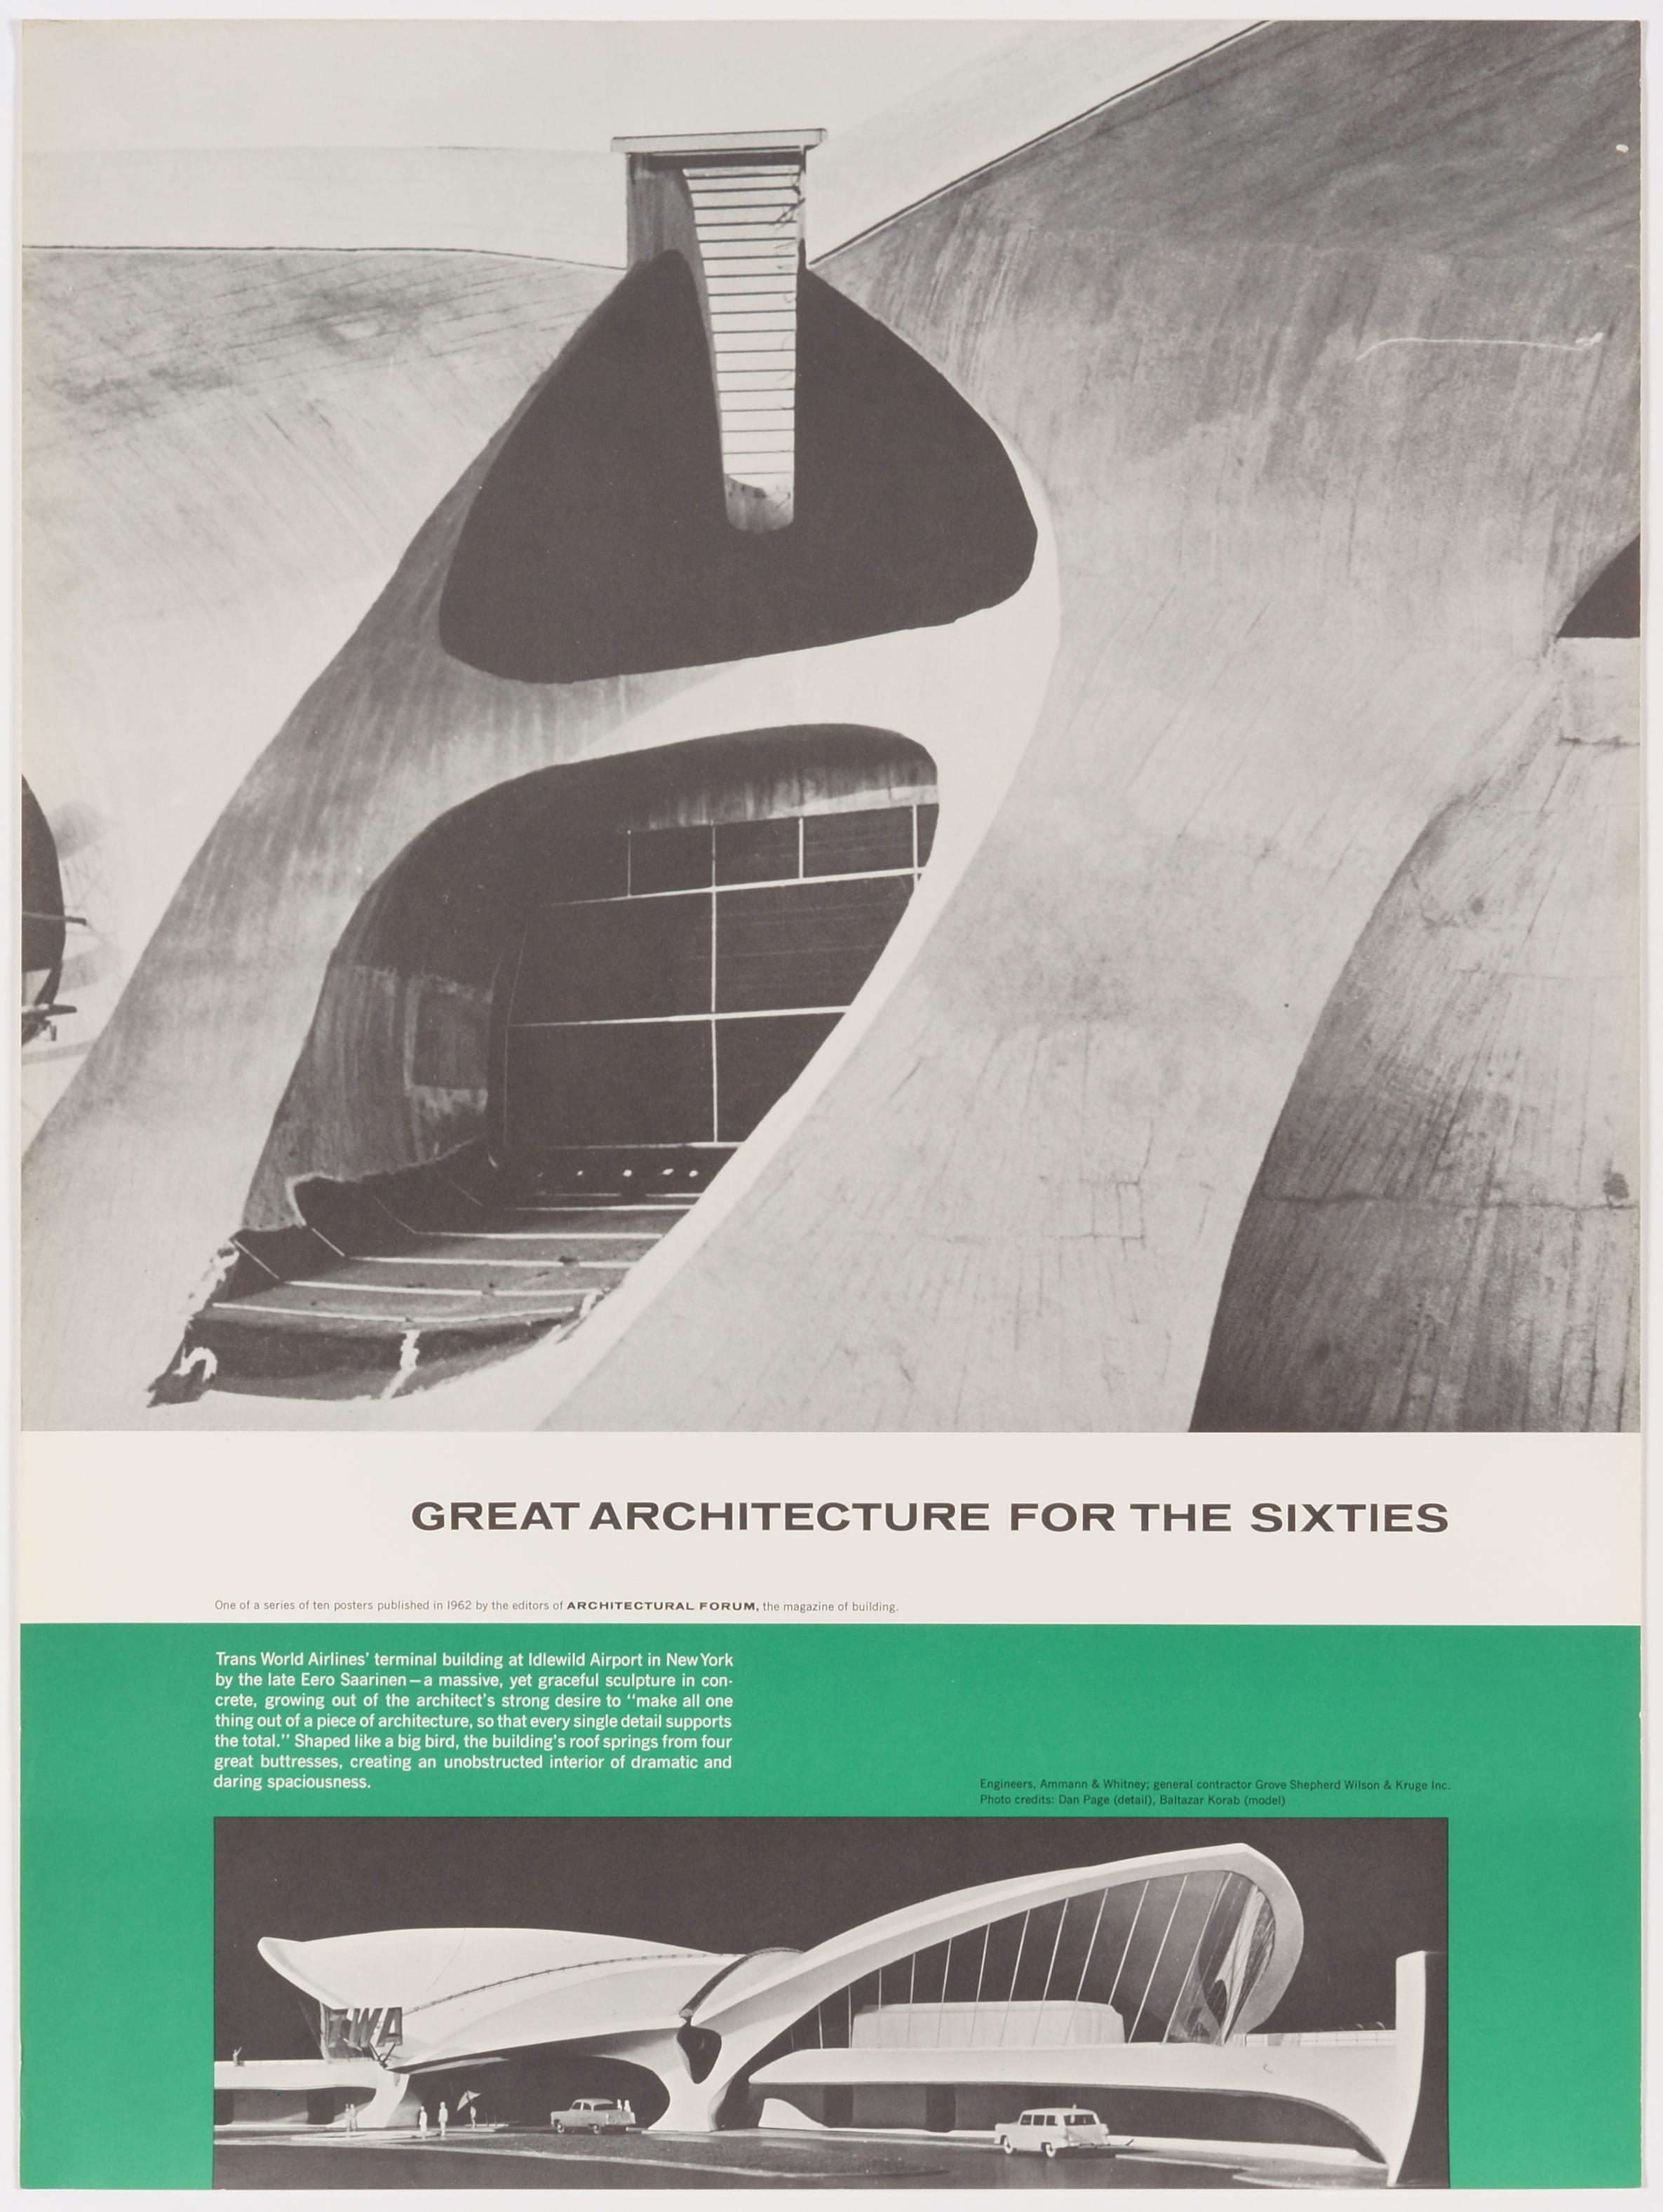 Great Architecture for the Sixties –TWAs Terminal Building by Eero Saarinen